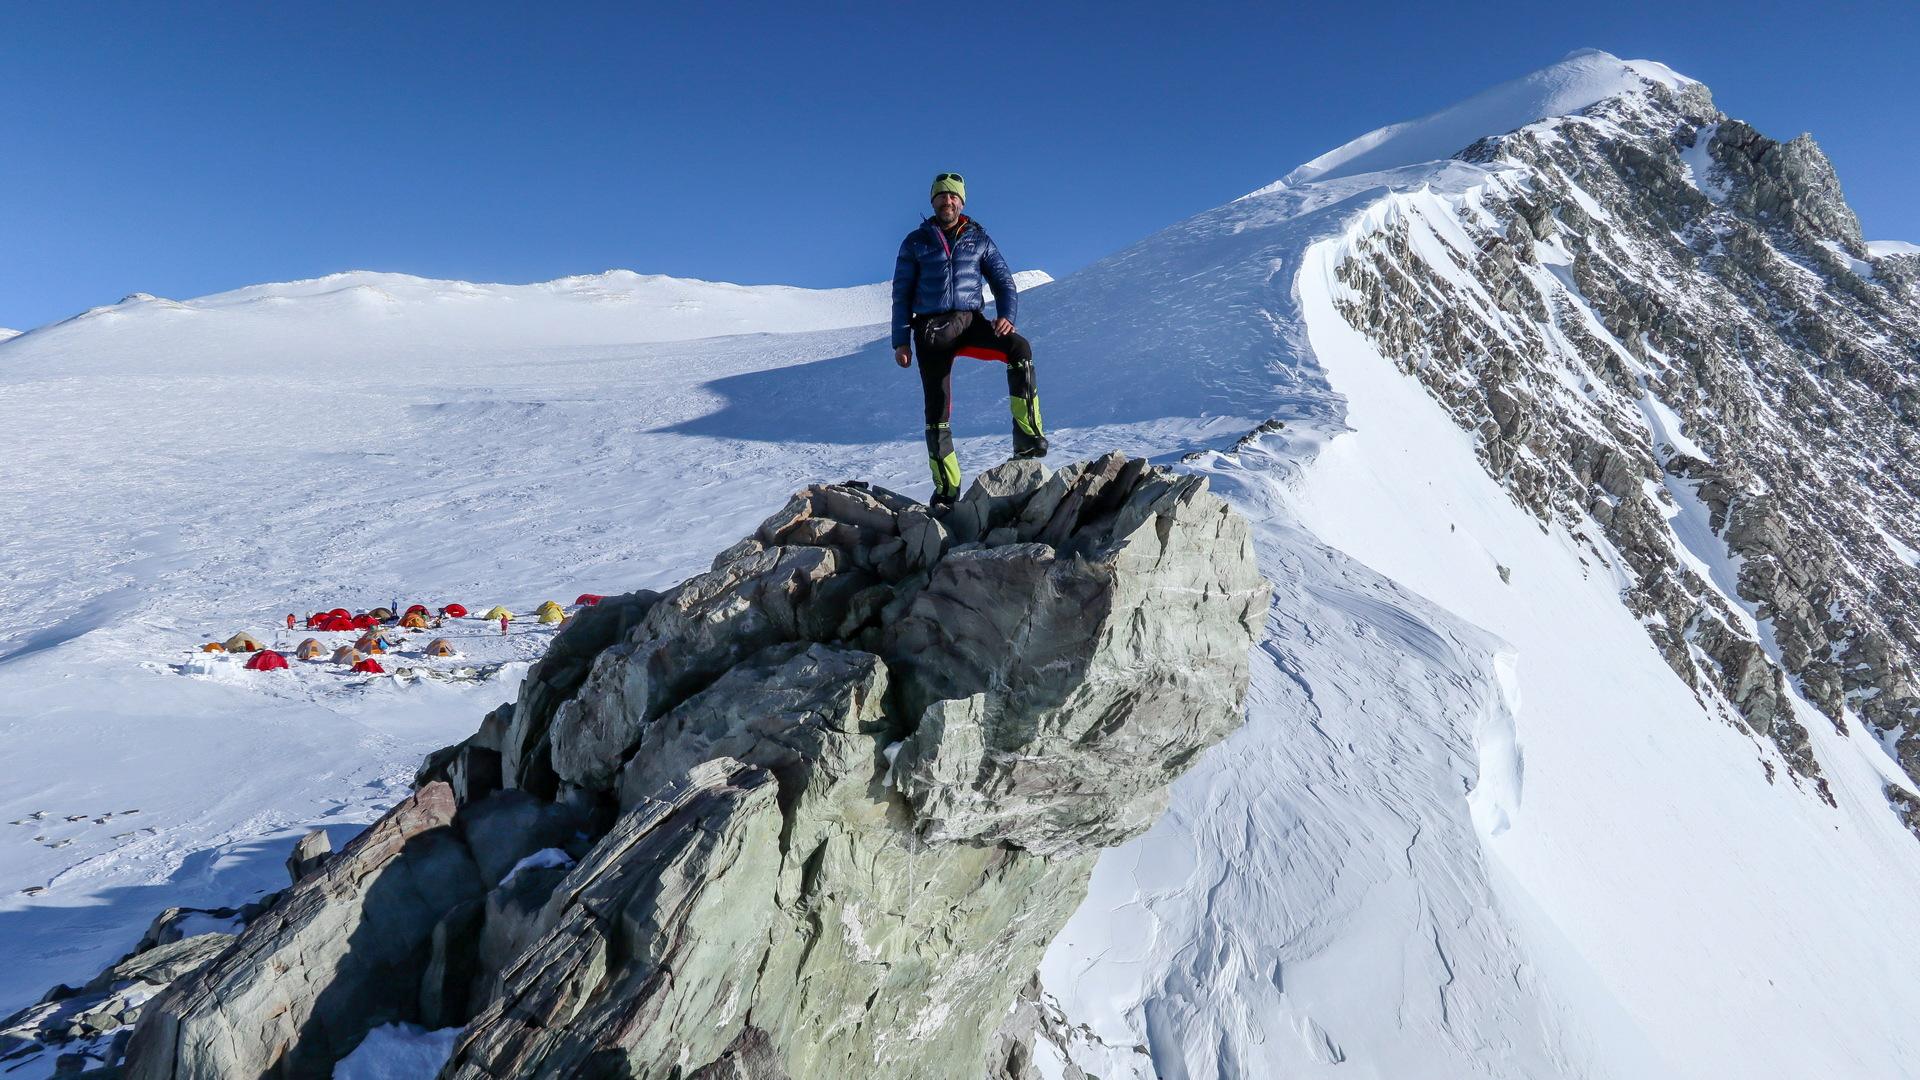 Cesta na vrchol Mount Vinson.